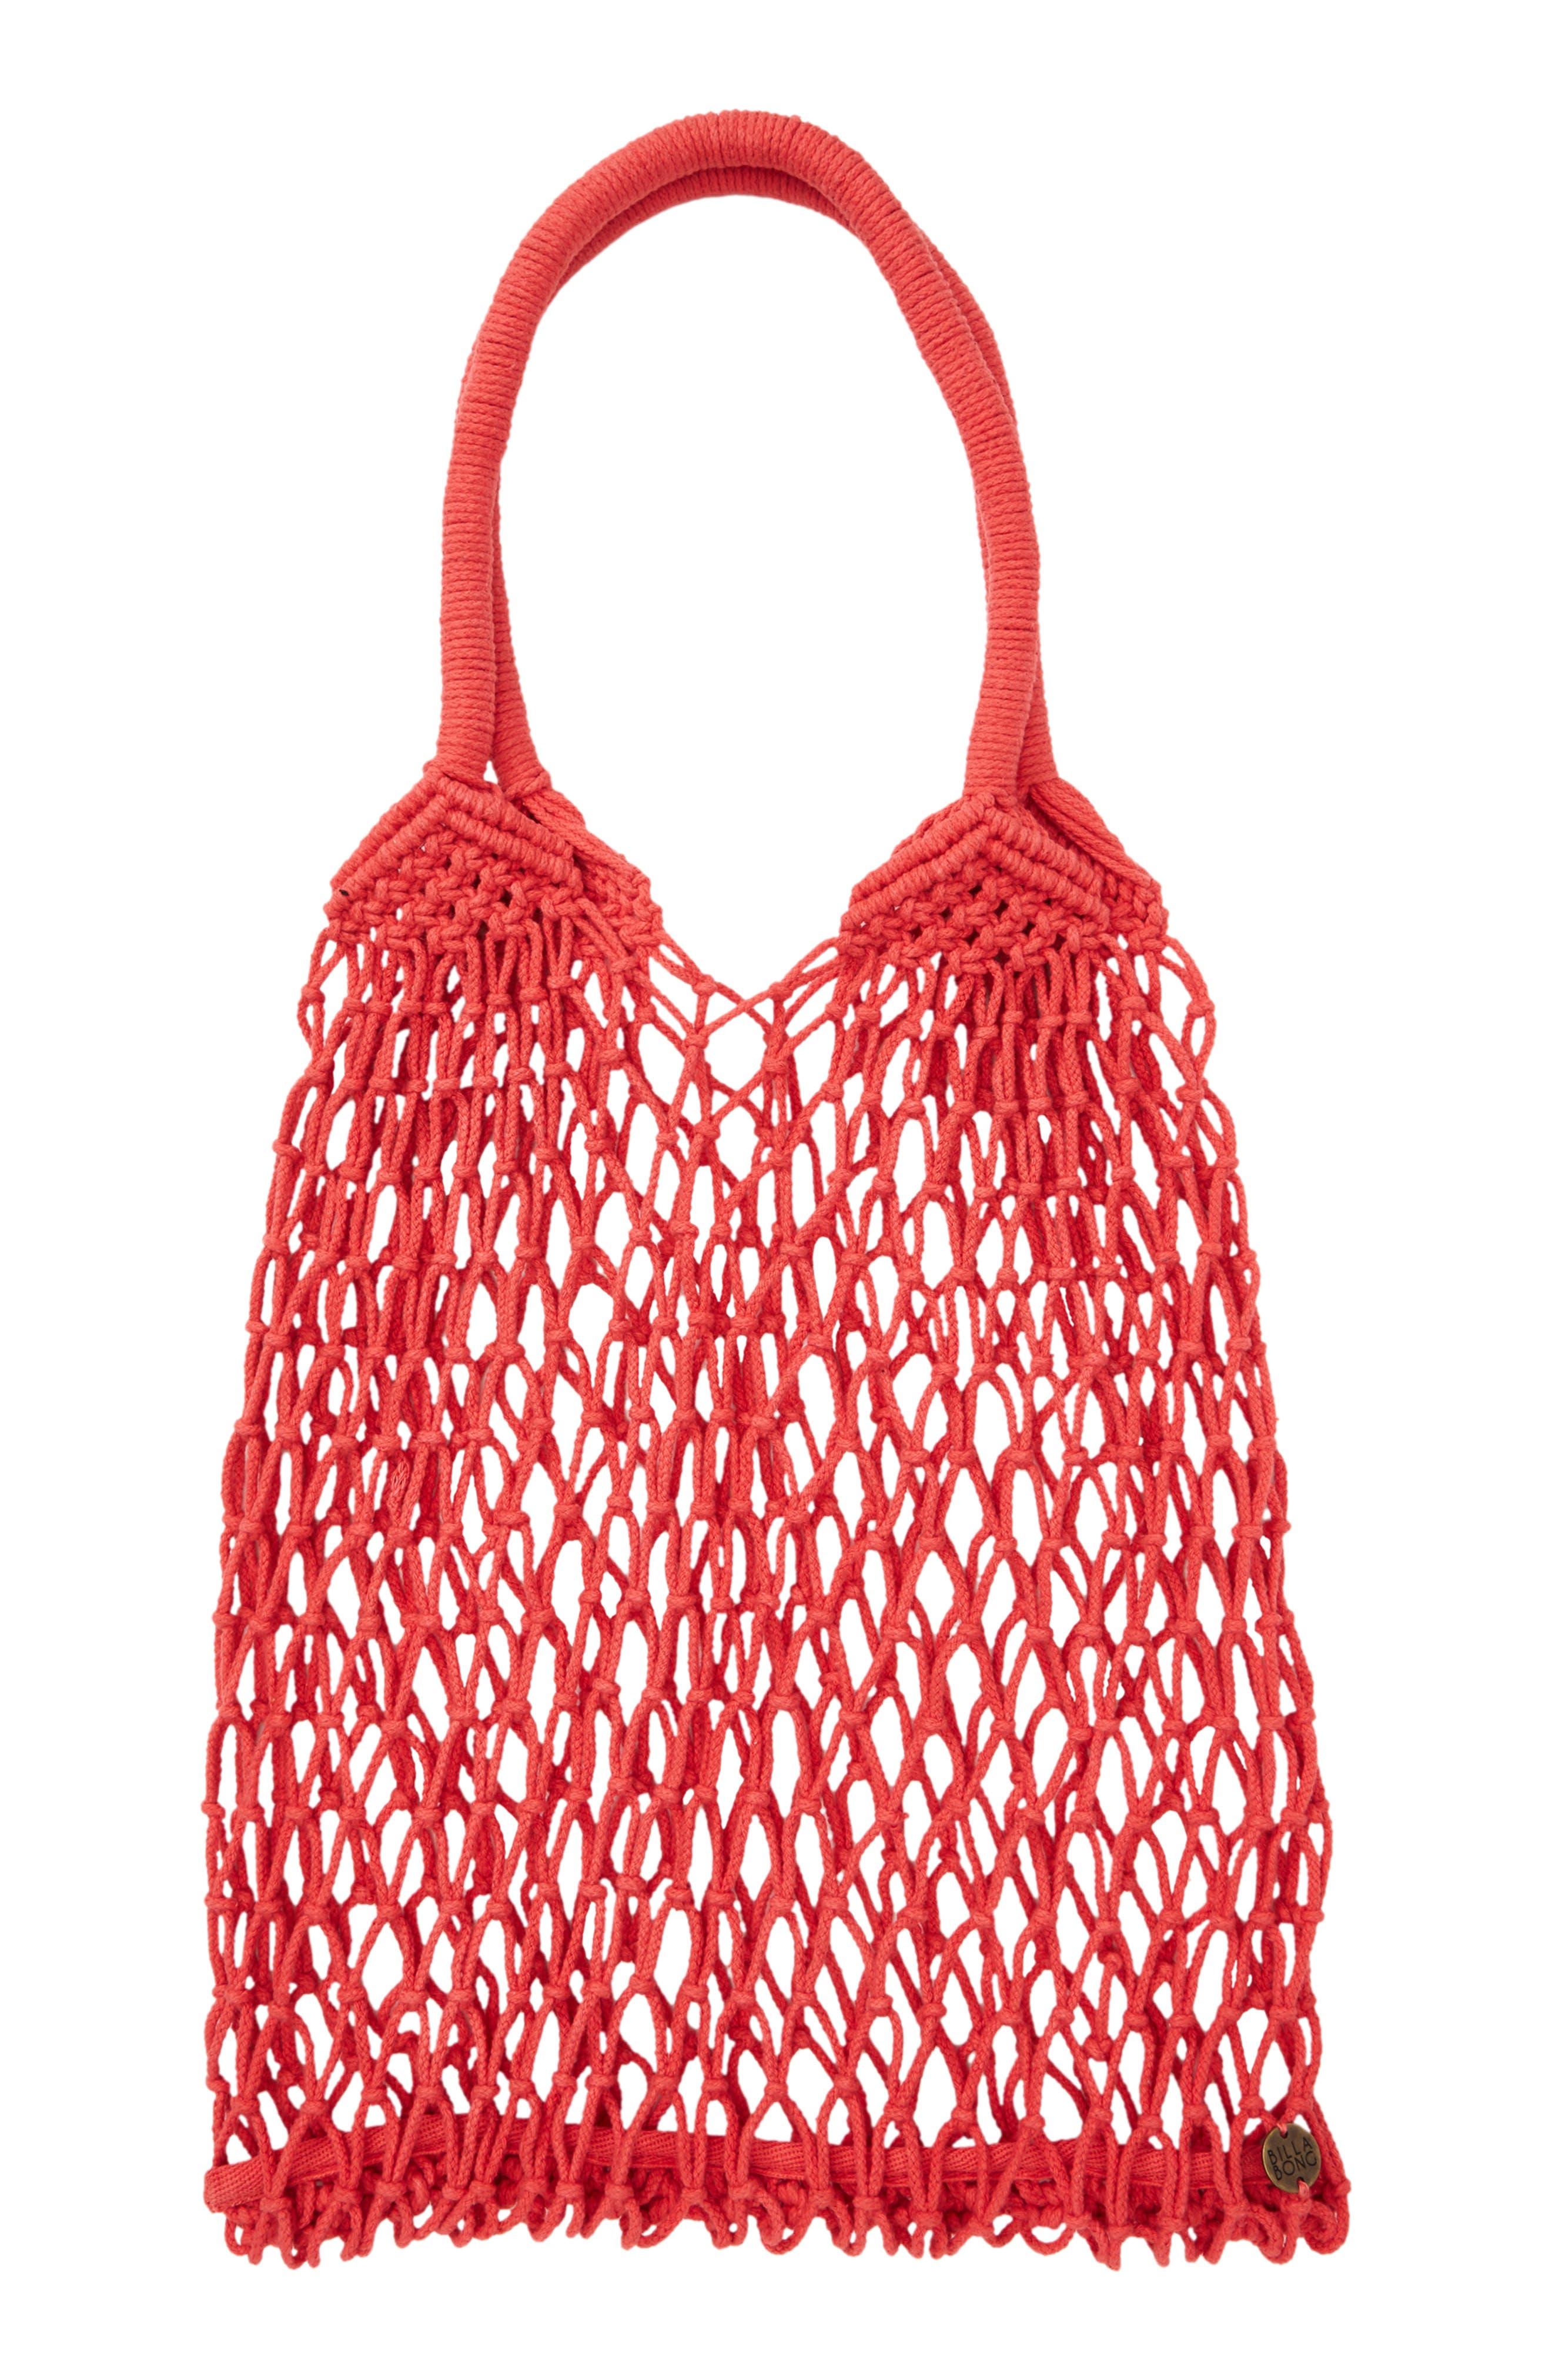 BILLABONG, Water U Doin Net Bag, Main thumbnail 1, color, SUNSET RED